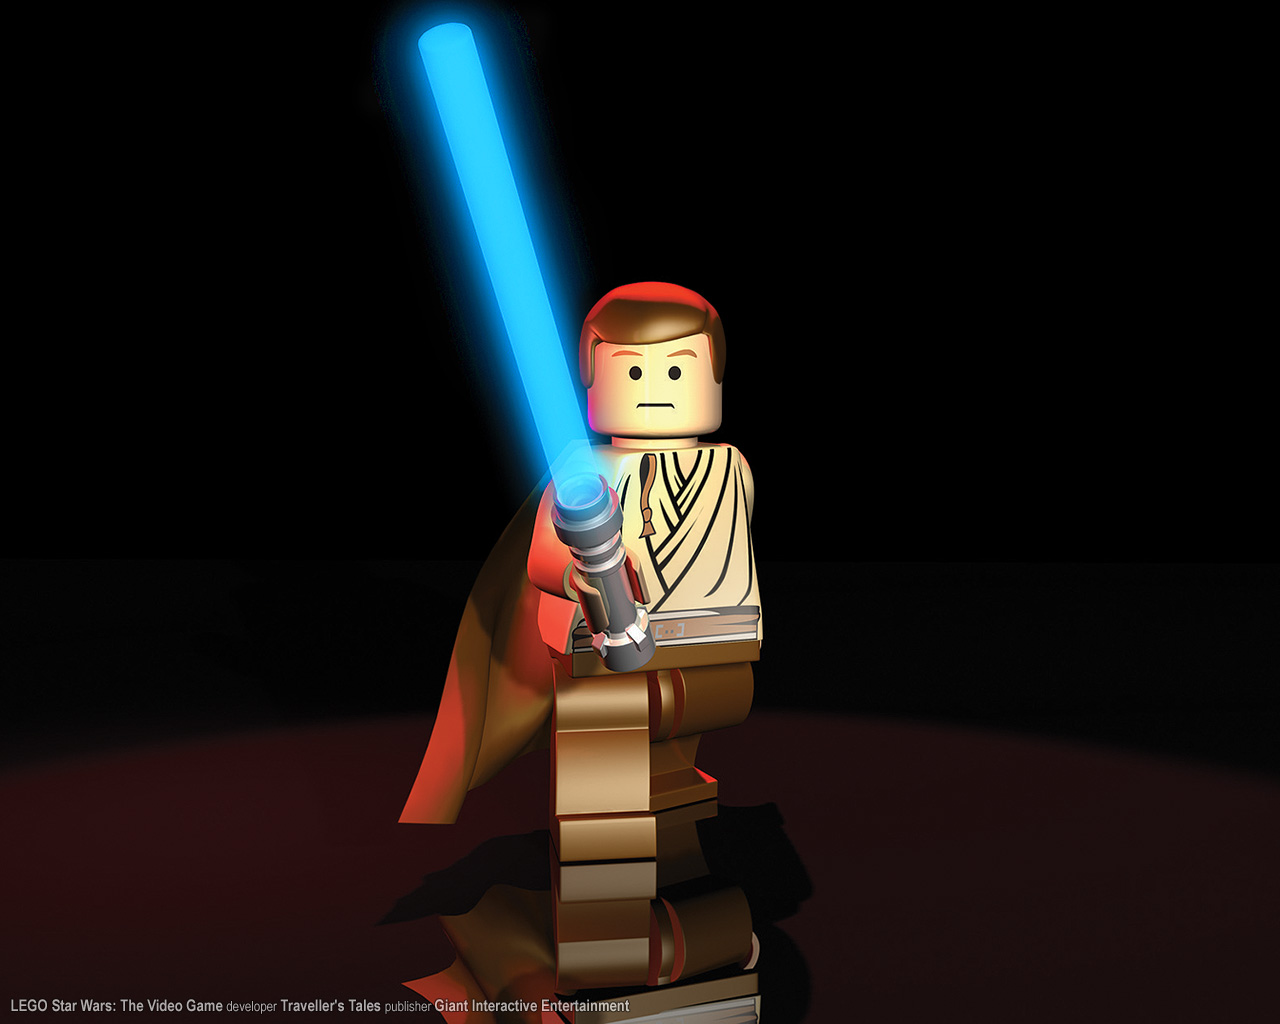 Download Wallpapers Download Star Wars Dark Stars Darth 1280x1024